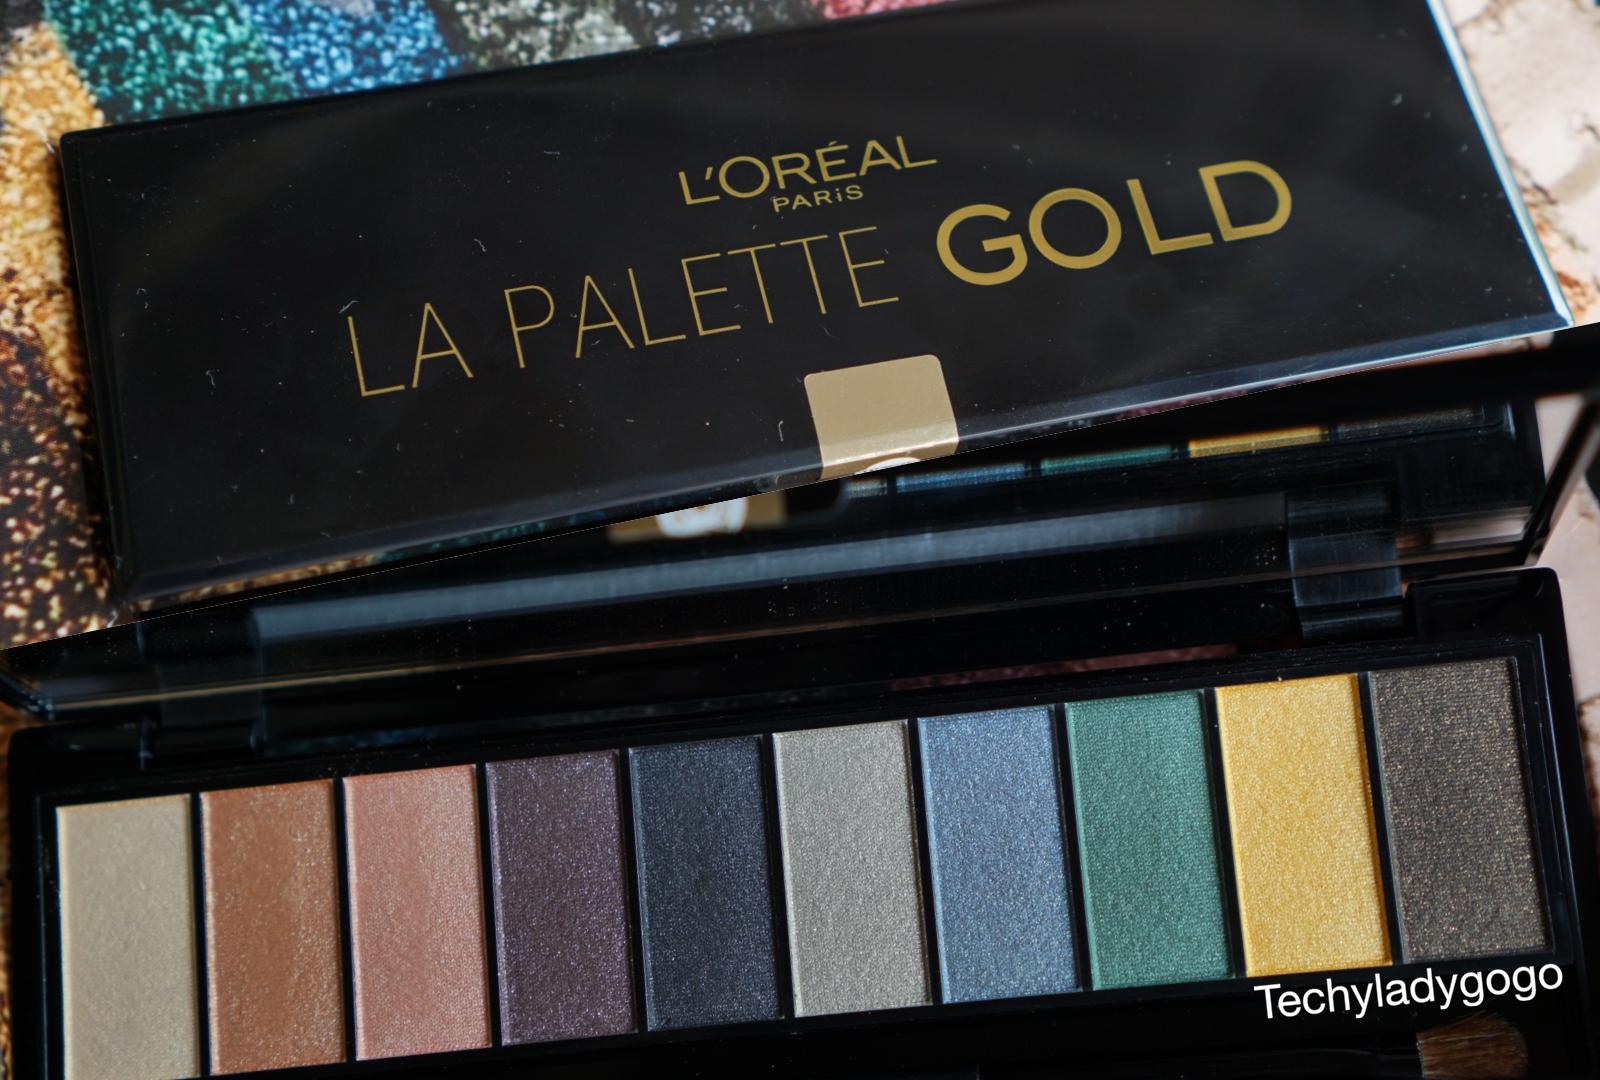 LOREAL LA PALETTE GOLD สว้อตชสี อายแชโดว์พาเลทผสมพิคเมนท์ สีทอง 10 เฉดสี  ข้อมูลเฉพาะของ ลอรีอัล ปารีส คัลเลอร์ ริช ลา พาเลท โกลด์ อายแชโดว์